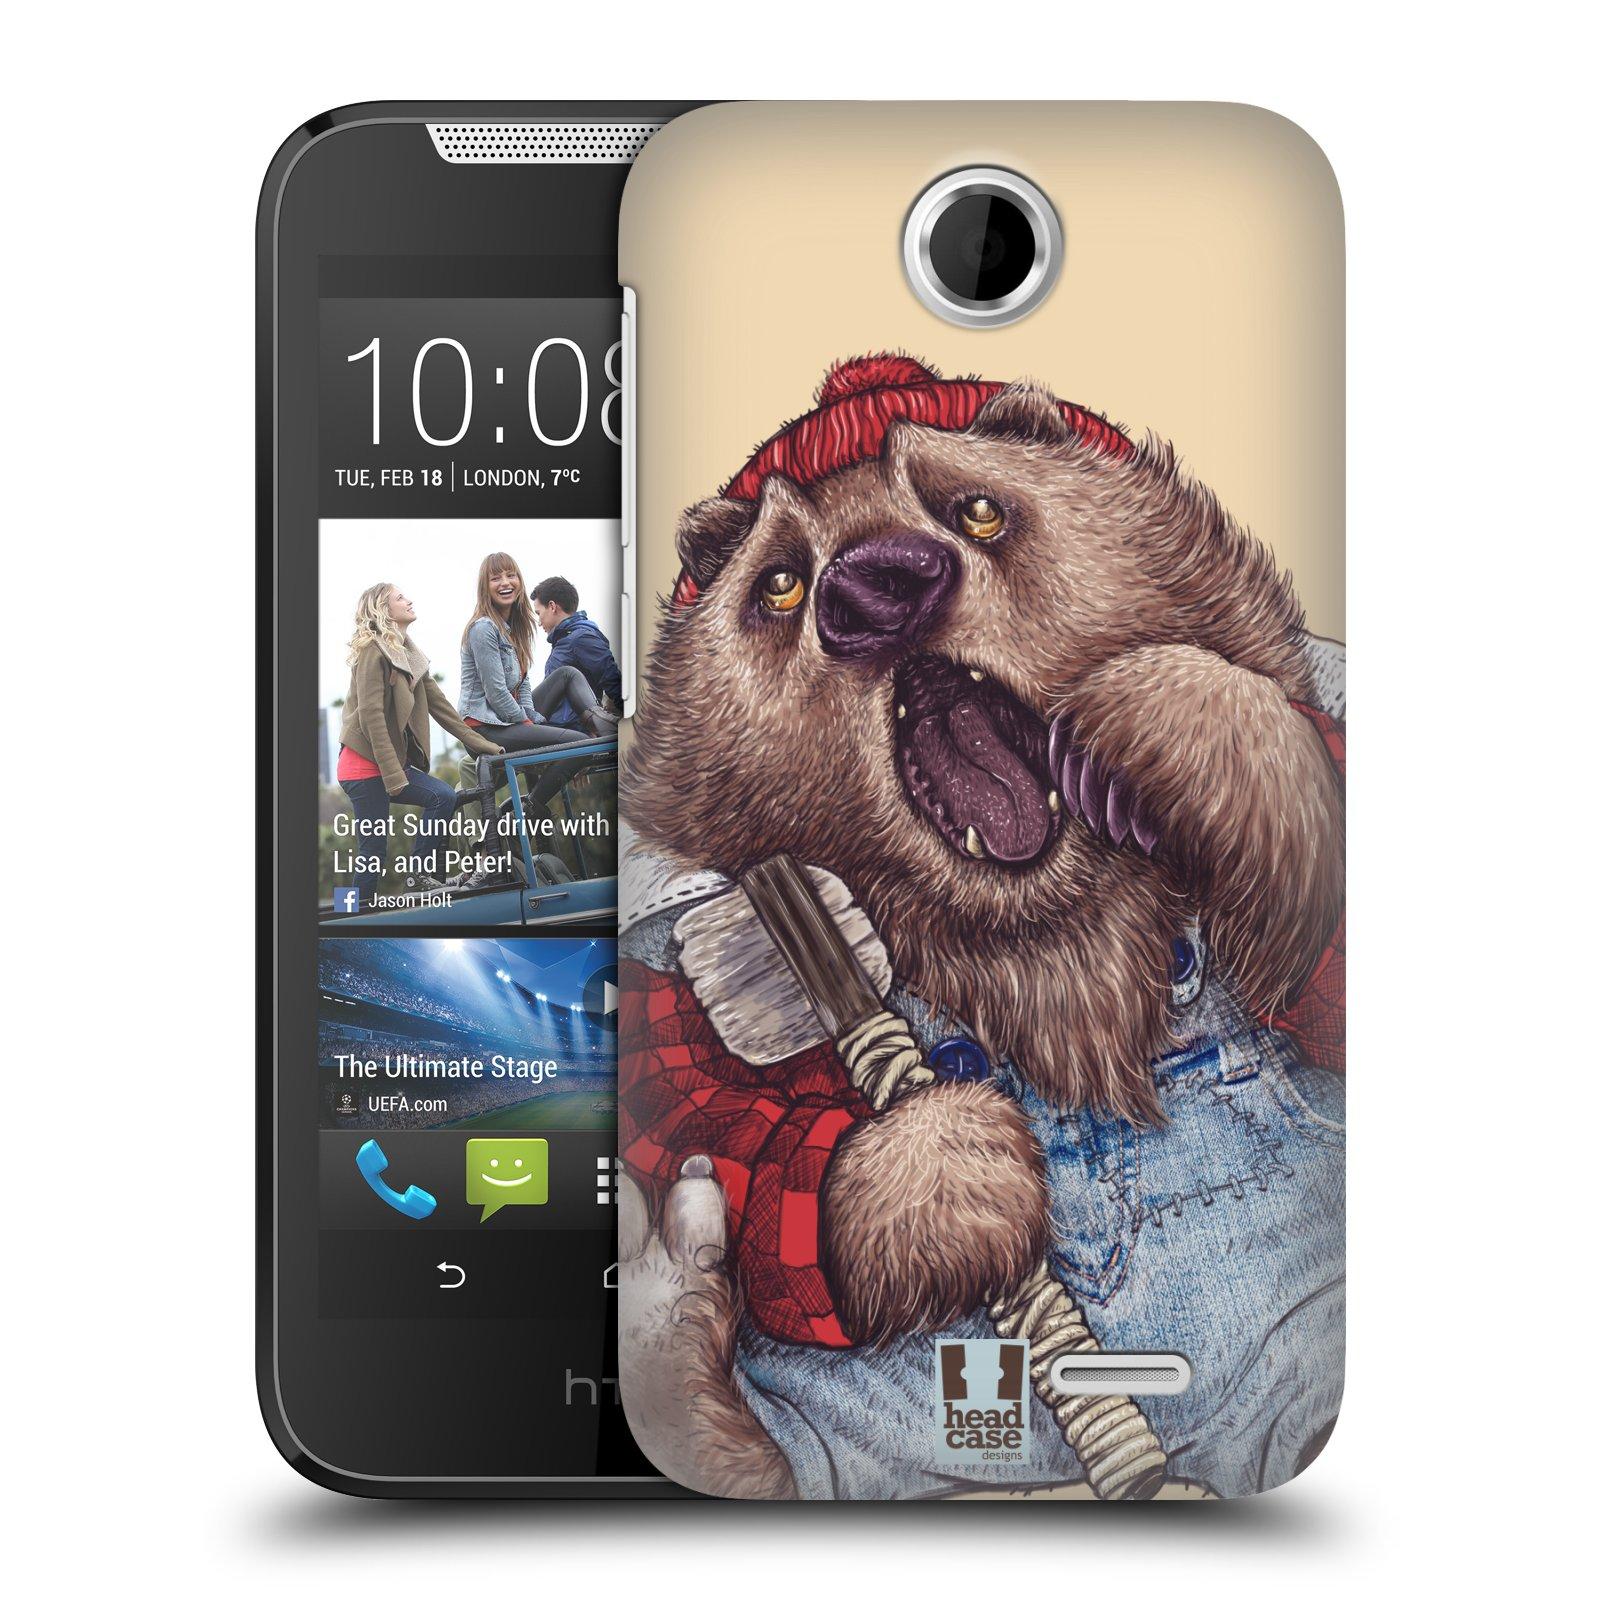 HEAD CASE plastový obal na mobil HTC Desire 310 vzor Kreslená zvířátka medvěd